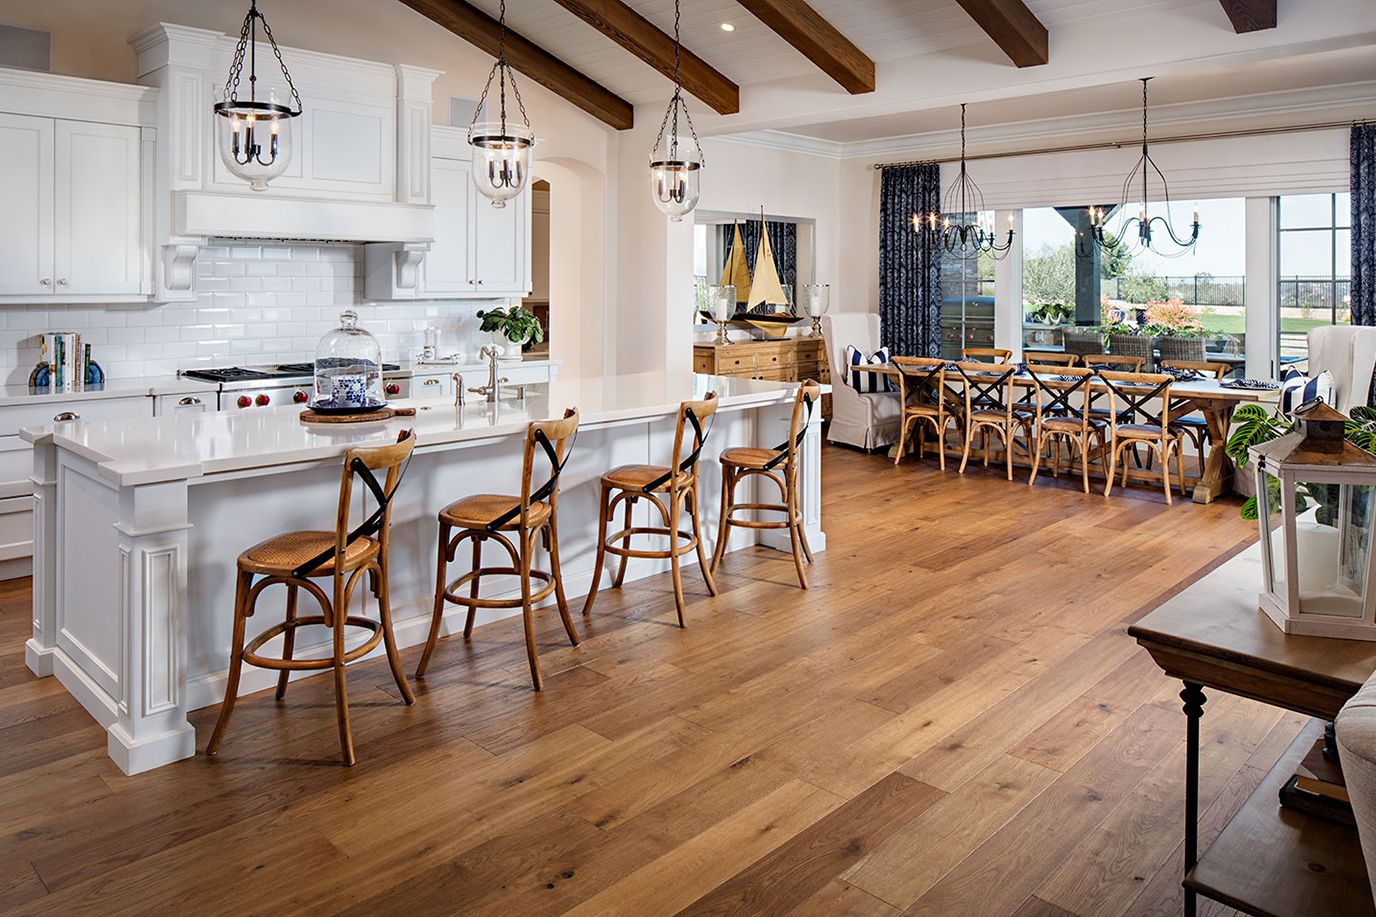 del mar interior design belmont trail court kitchen design open luxury kitchen design on kitchen interior luxury id=21598